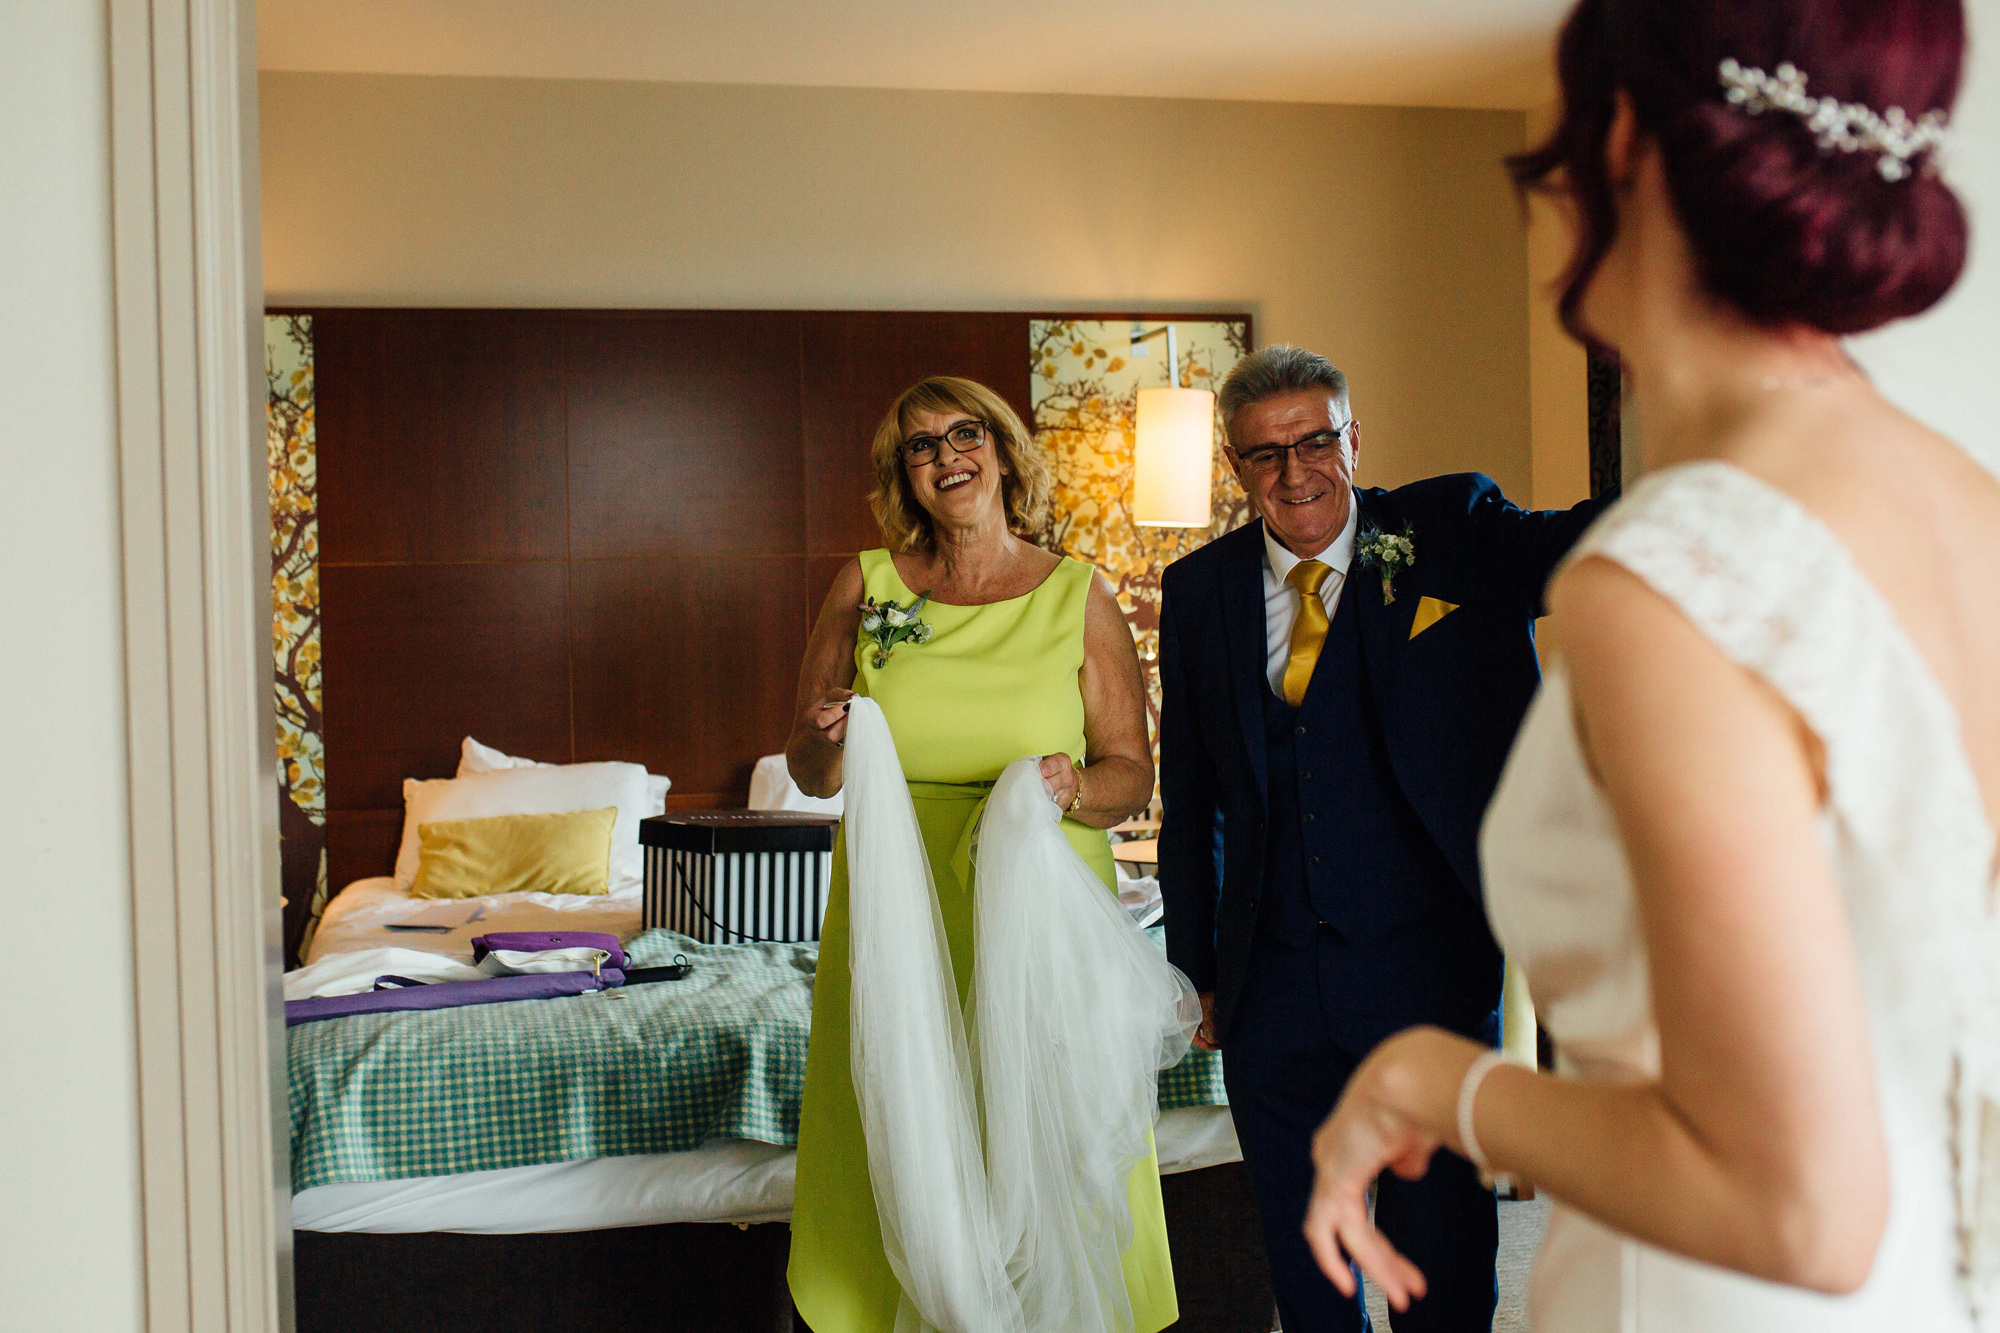 Sarah-Honeysuckle-Bias-Cut-Silk-Vintage-Inspired-Wedding-Gown-Sheffield-Wedding-Kate-Beaumont-6.jpg